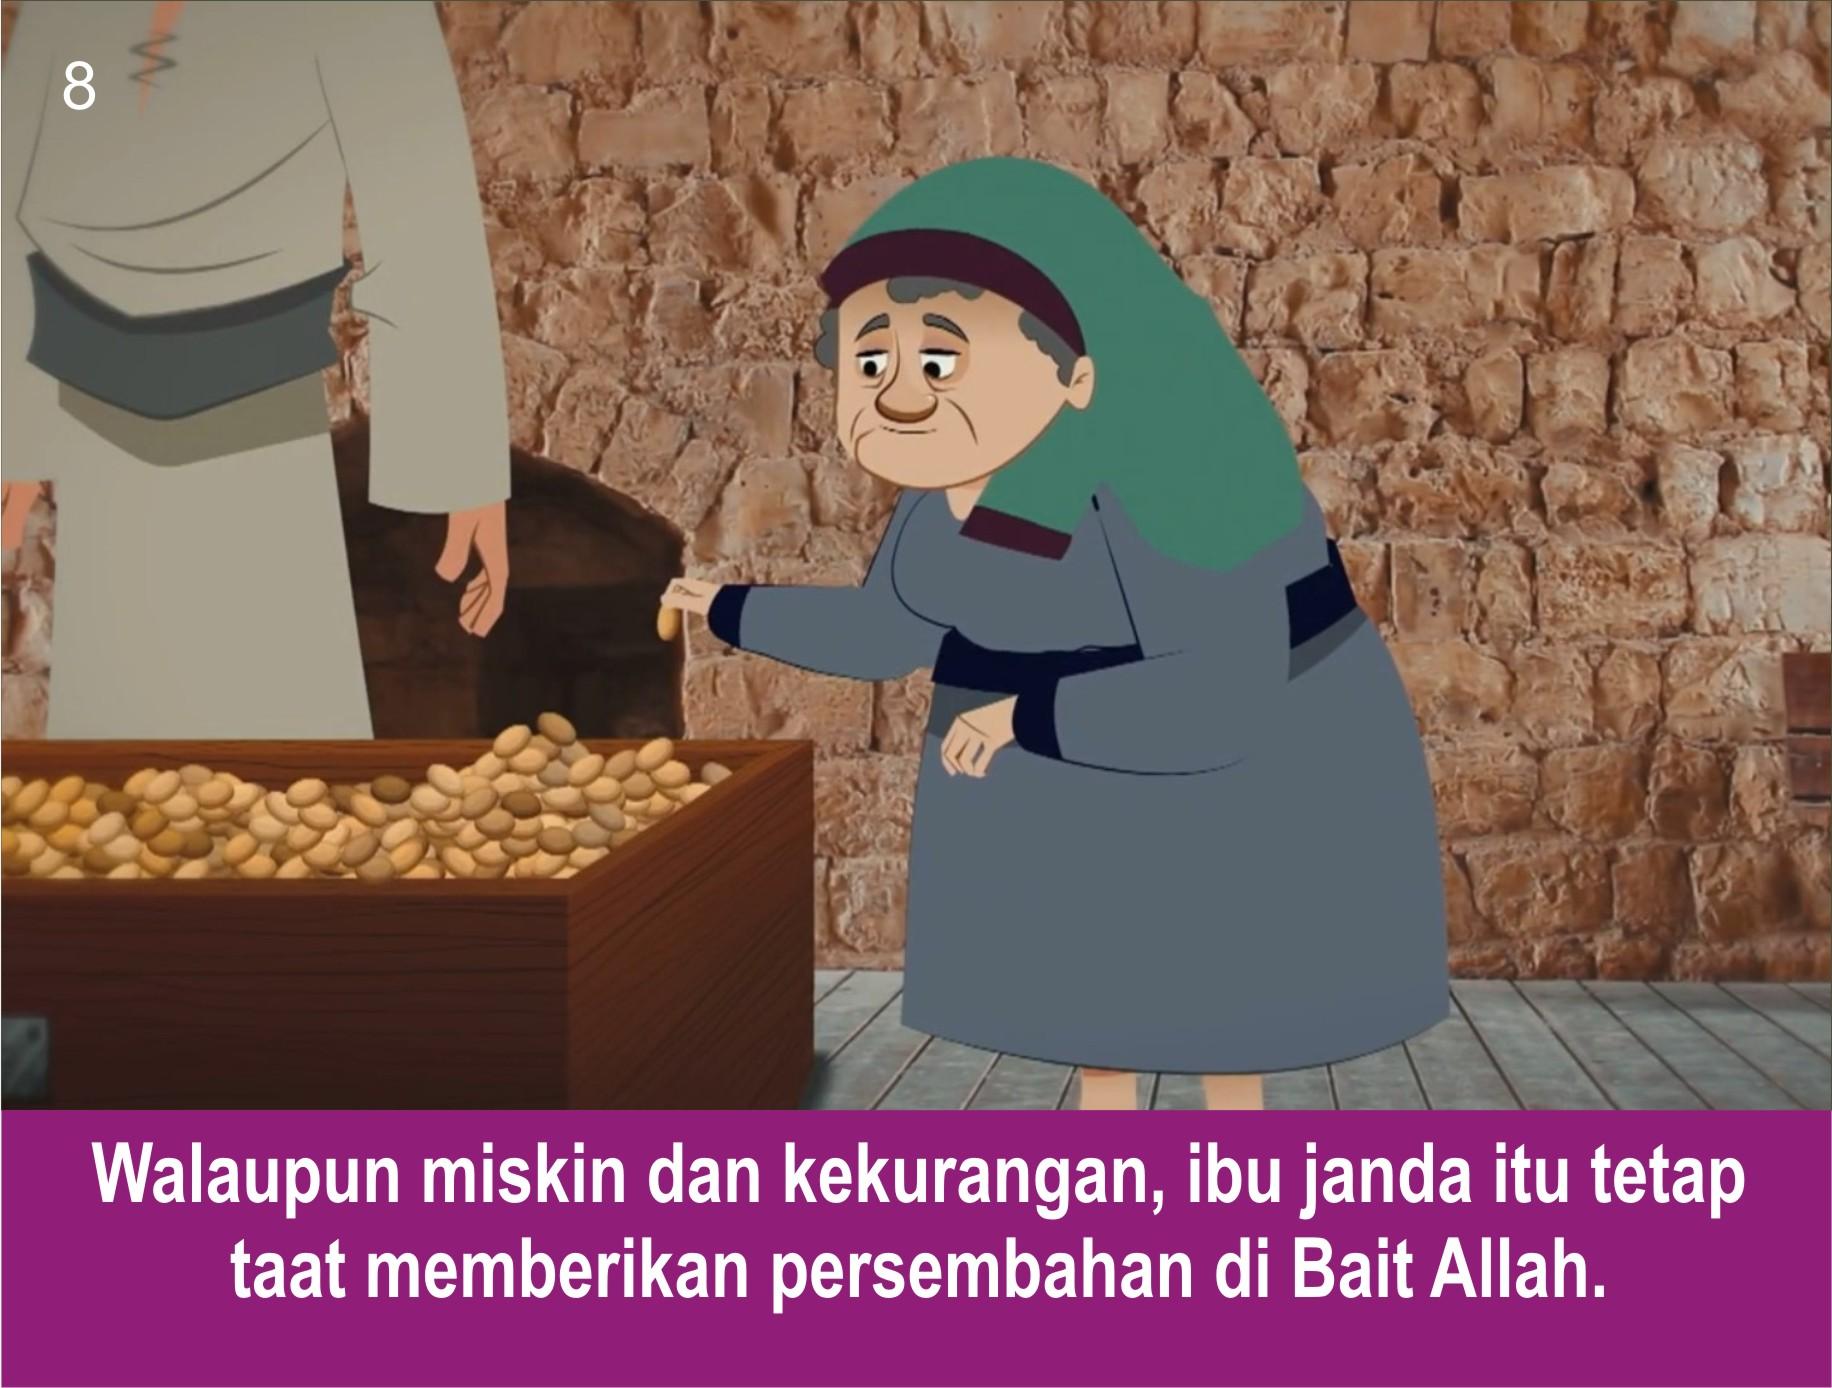 Komik Alkitab Anak Persembahan Seorang Janda Miskin